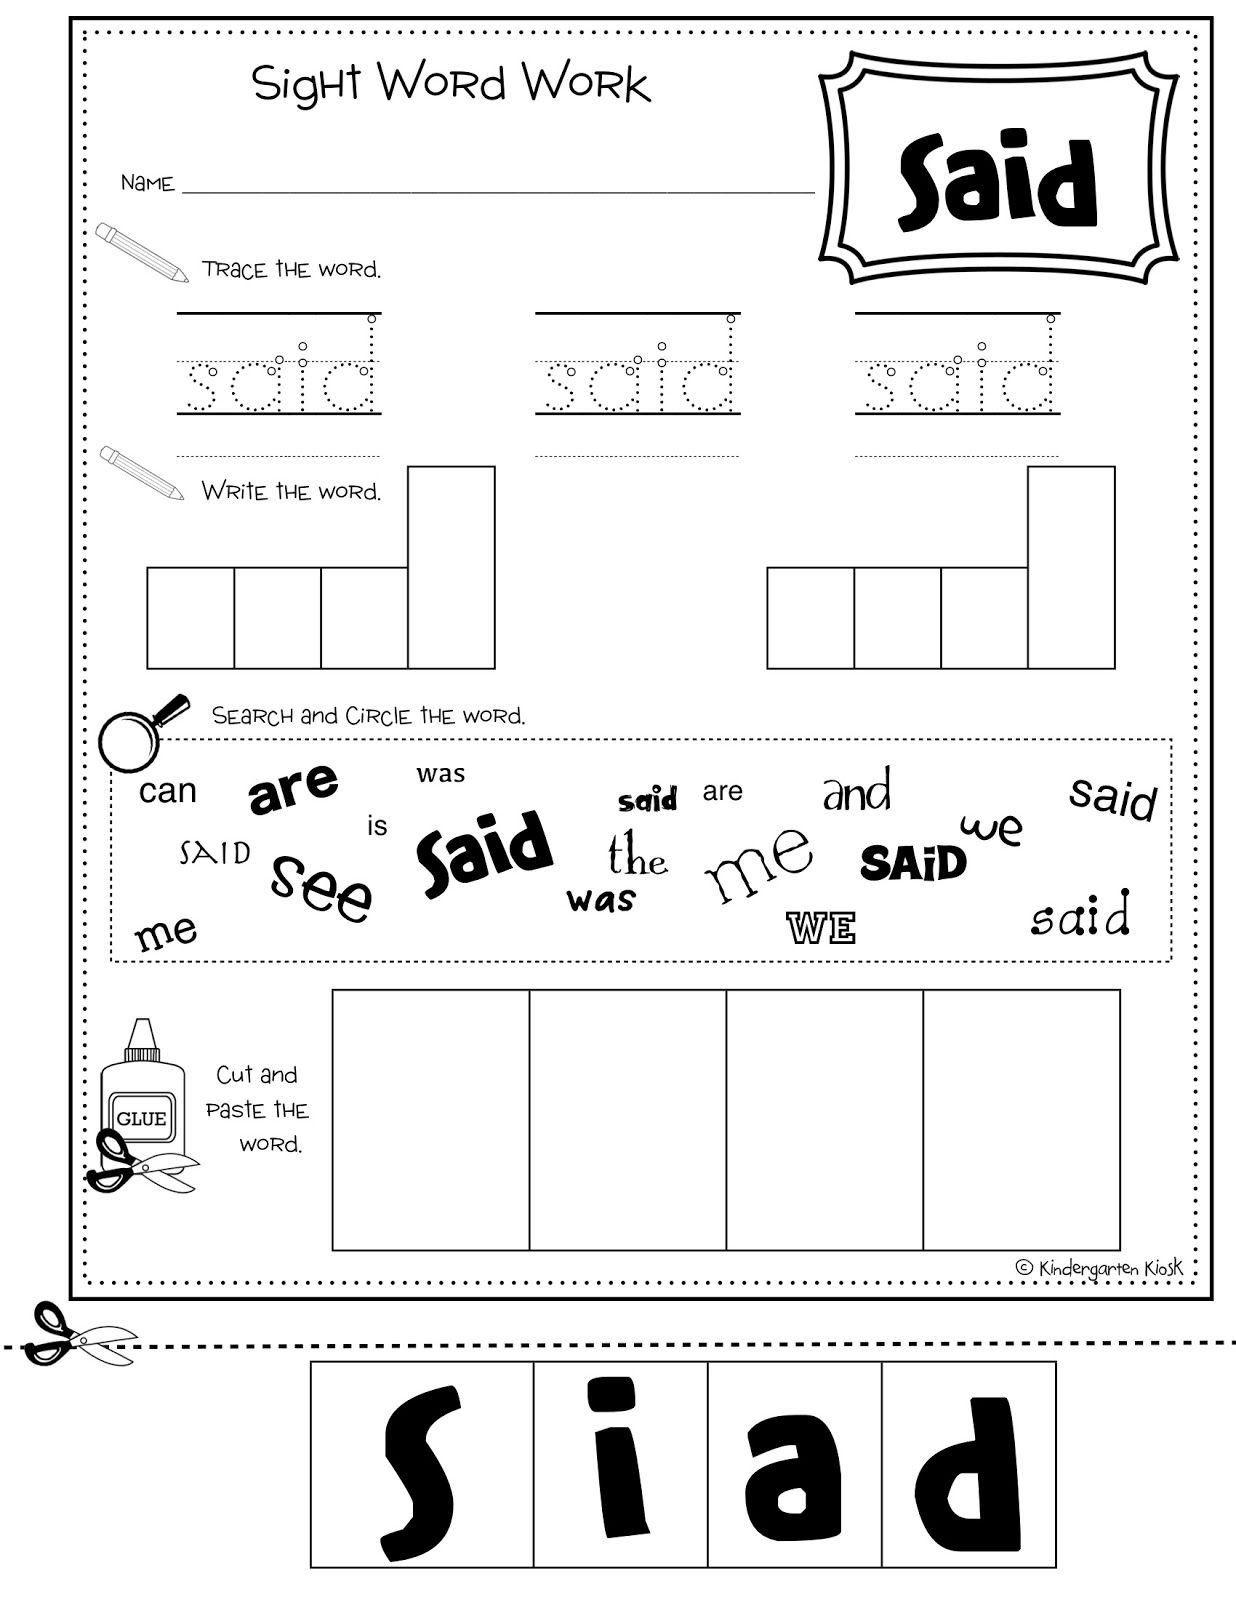 Make Sight Word Worksheets | Kindergarten Kiosk: Multi-Task Sight ...